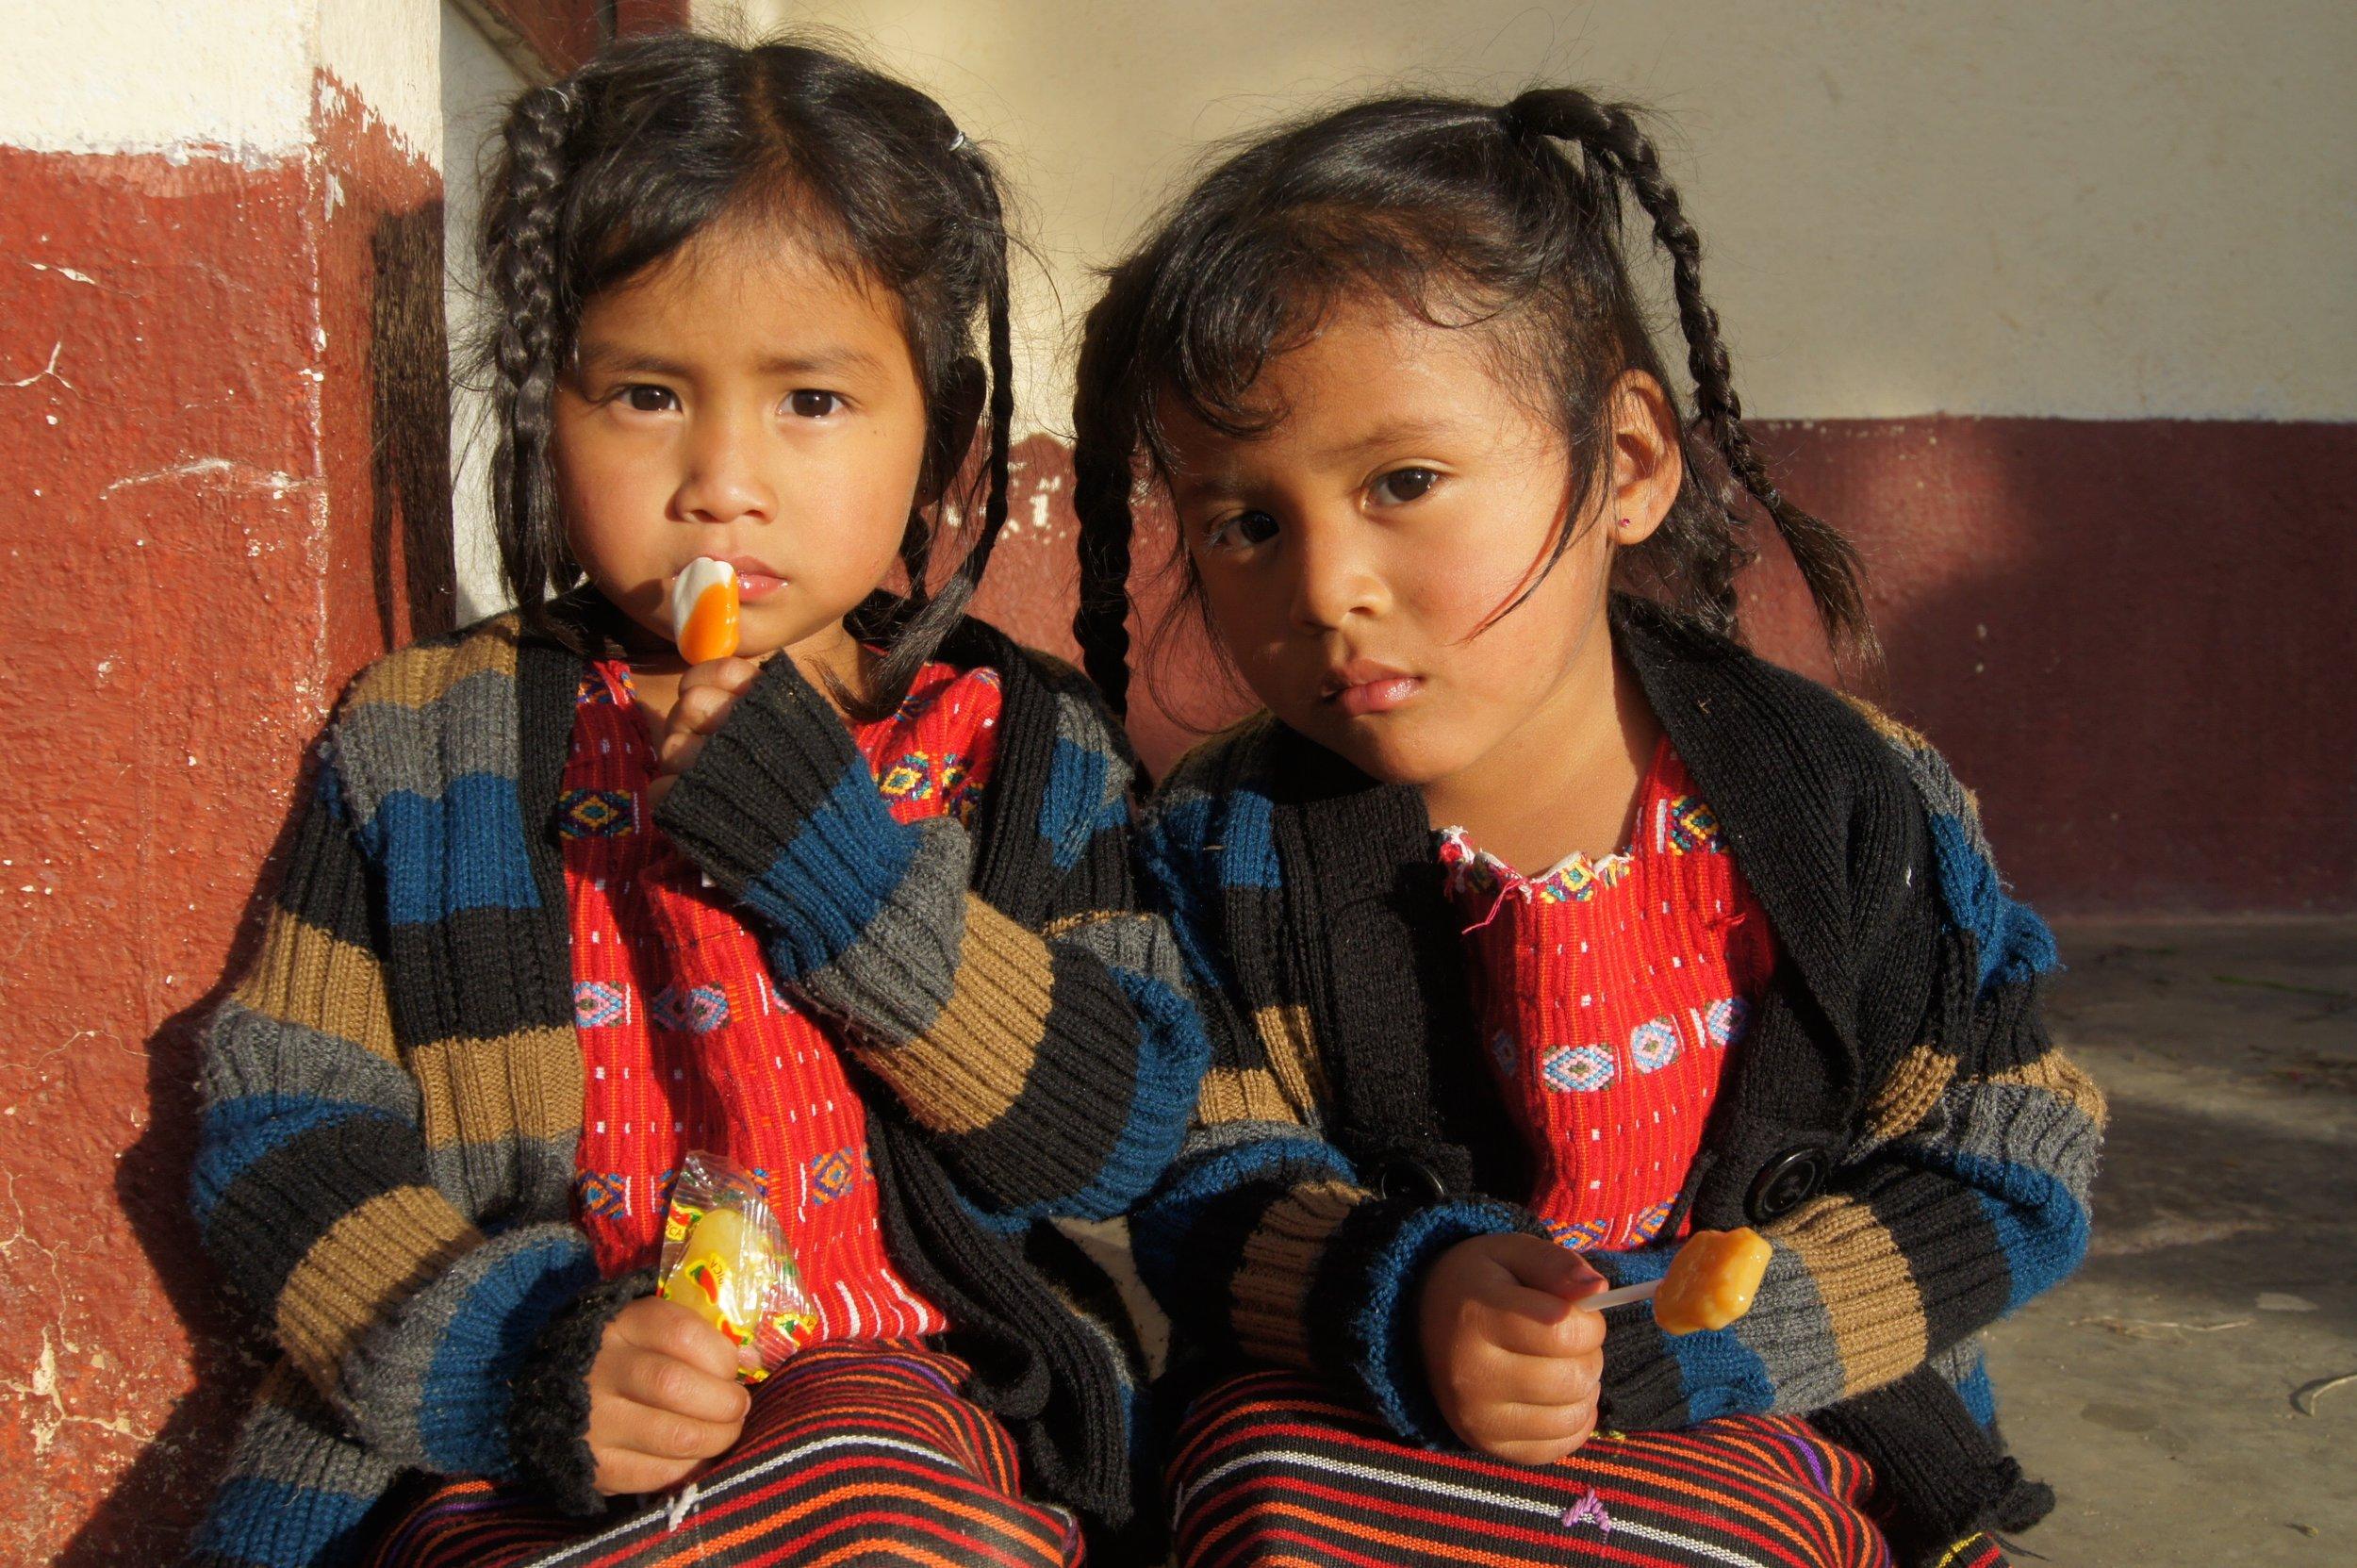 Kids in Guatemala